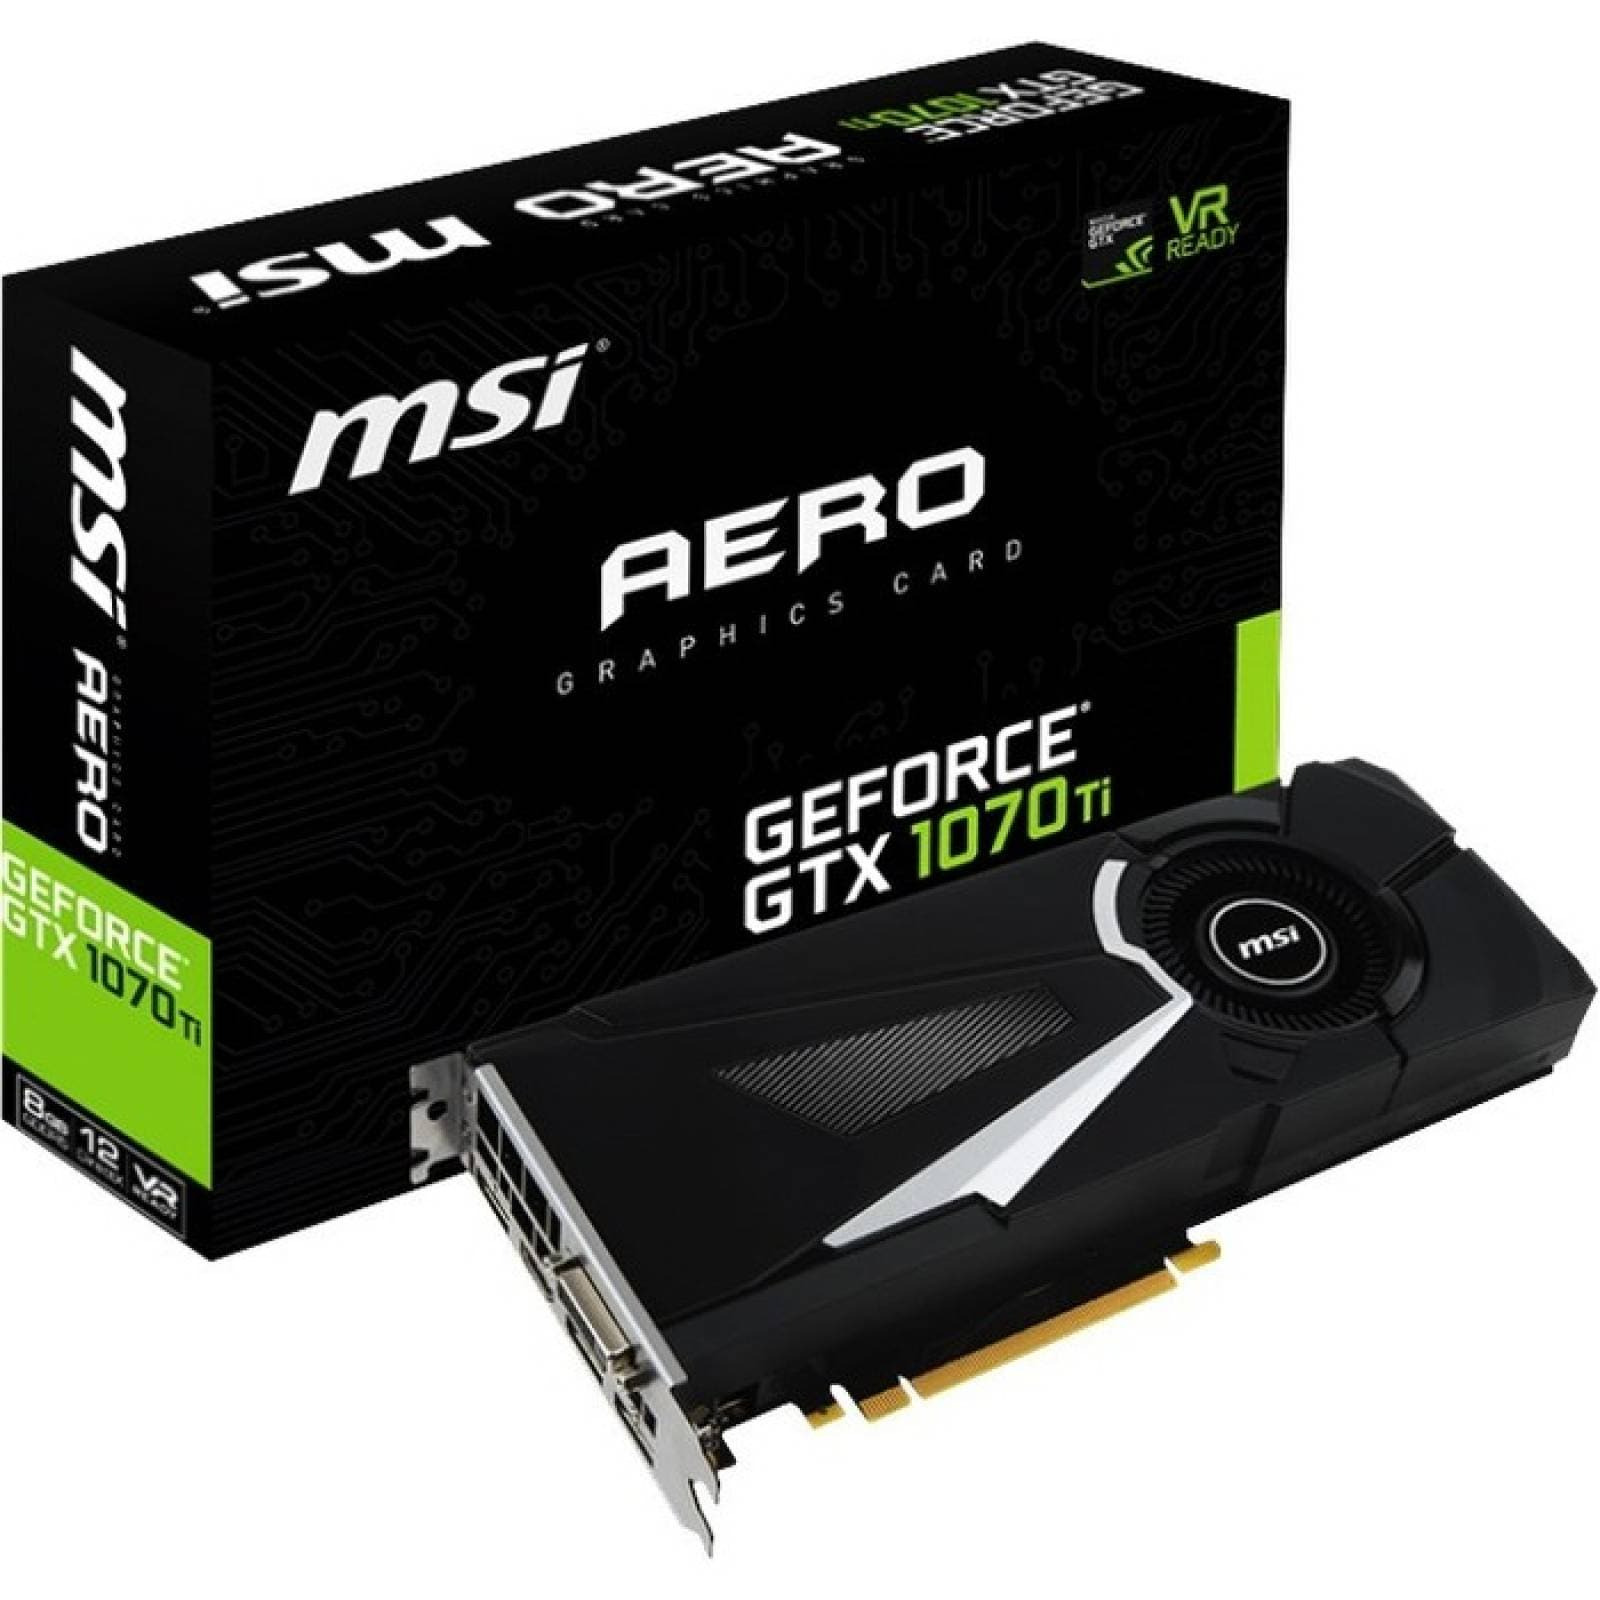 MSI AERO GTX 1070 Ti AERO 8G Tarjeta grfica GeForce GTX 1070  Ncleo de 161 GHz  Reloj de aumento de 168 GHz  8 GB